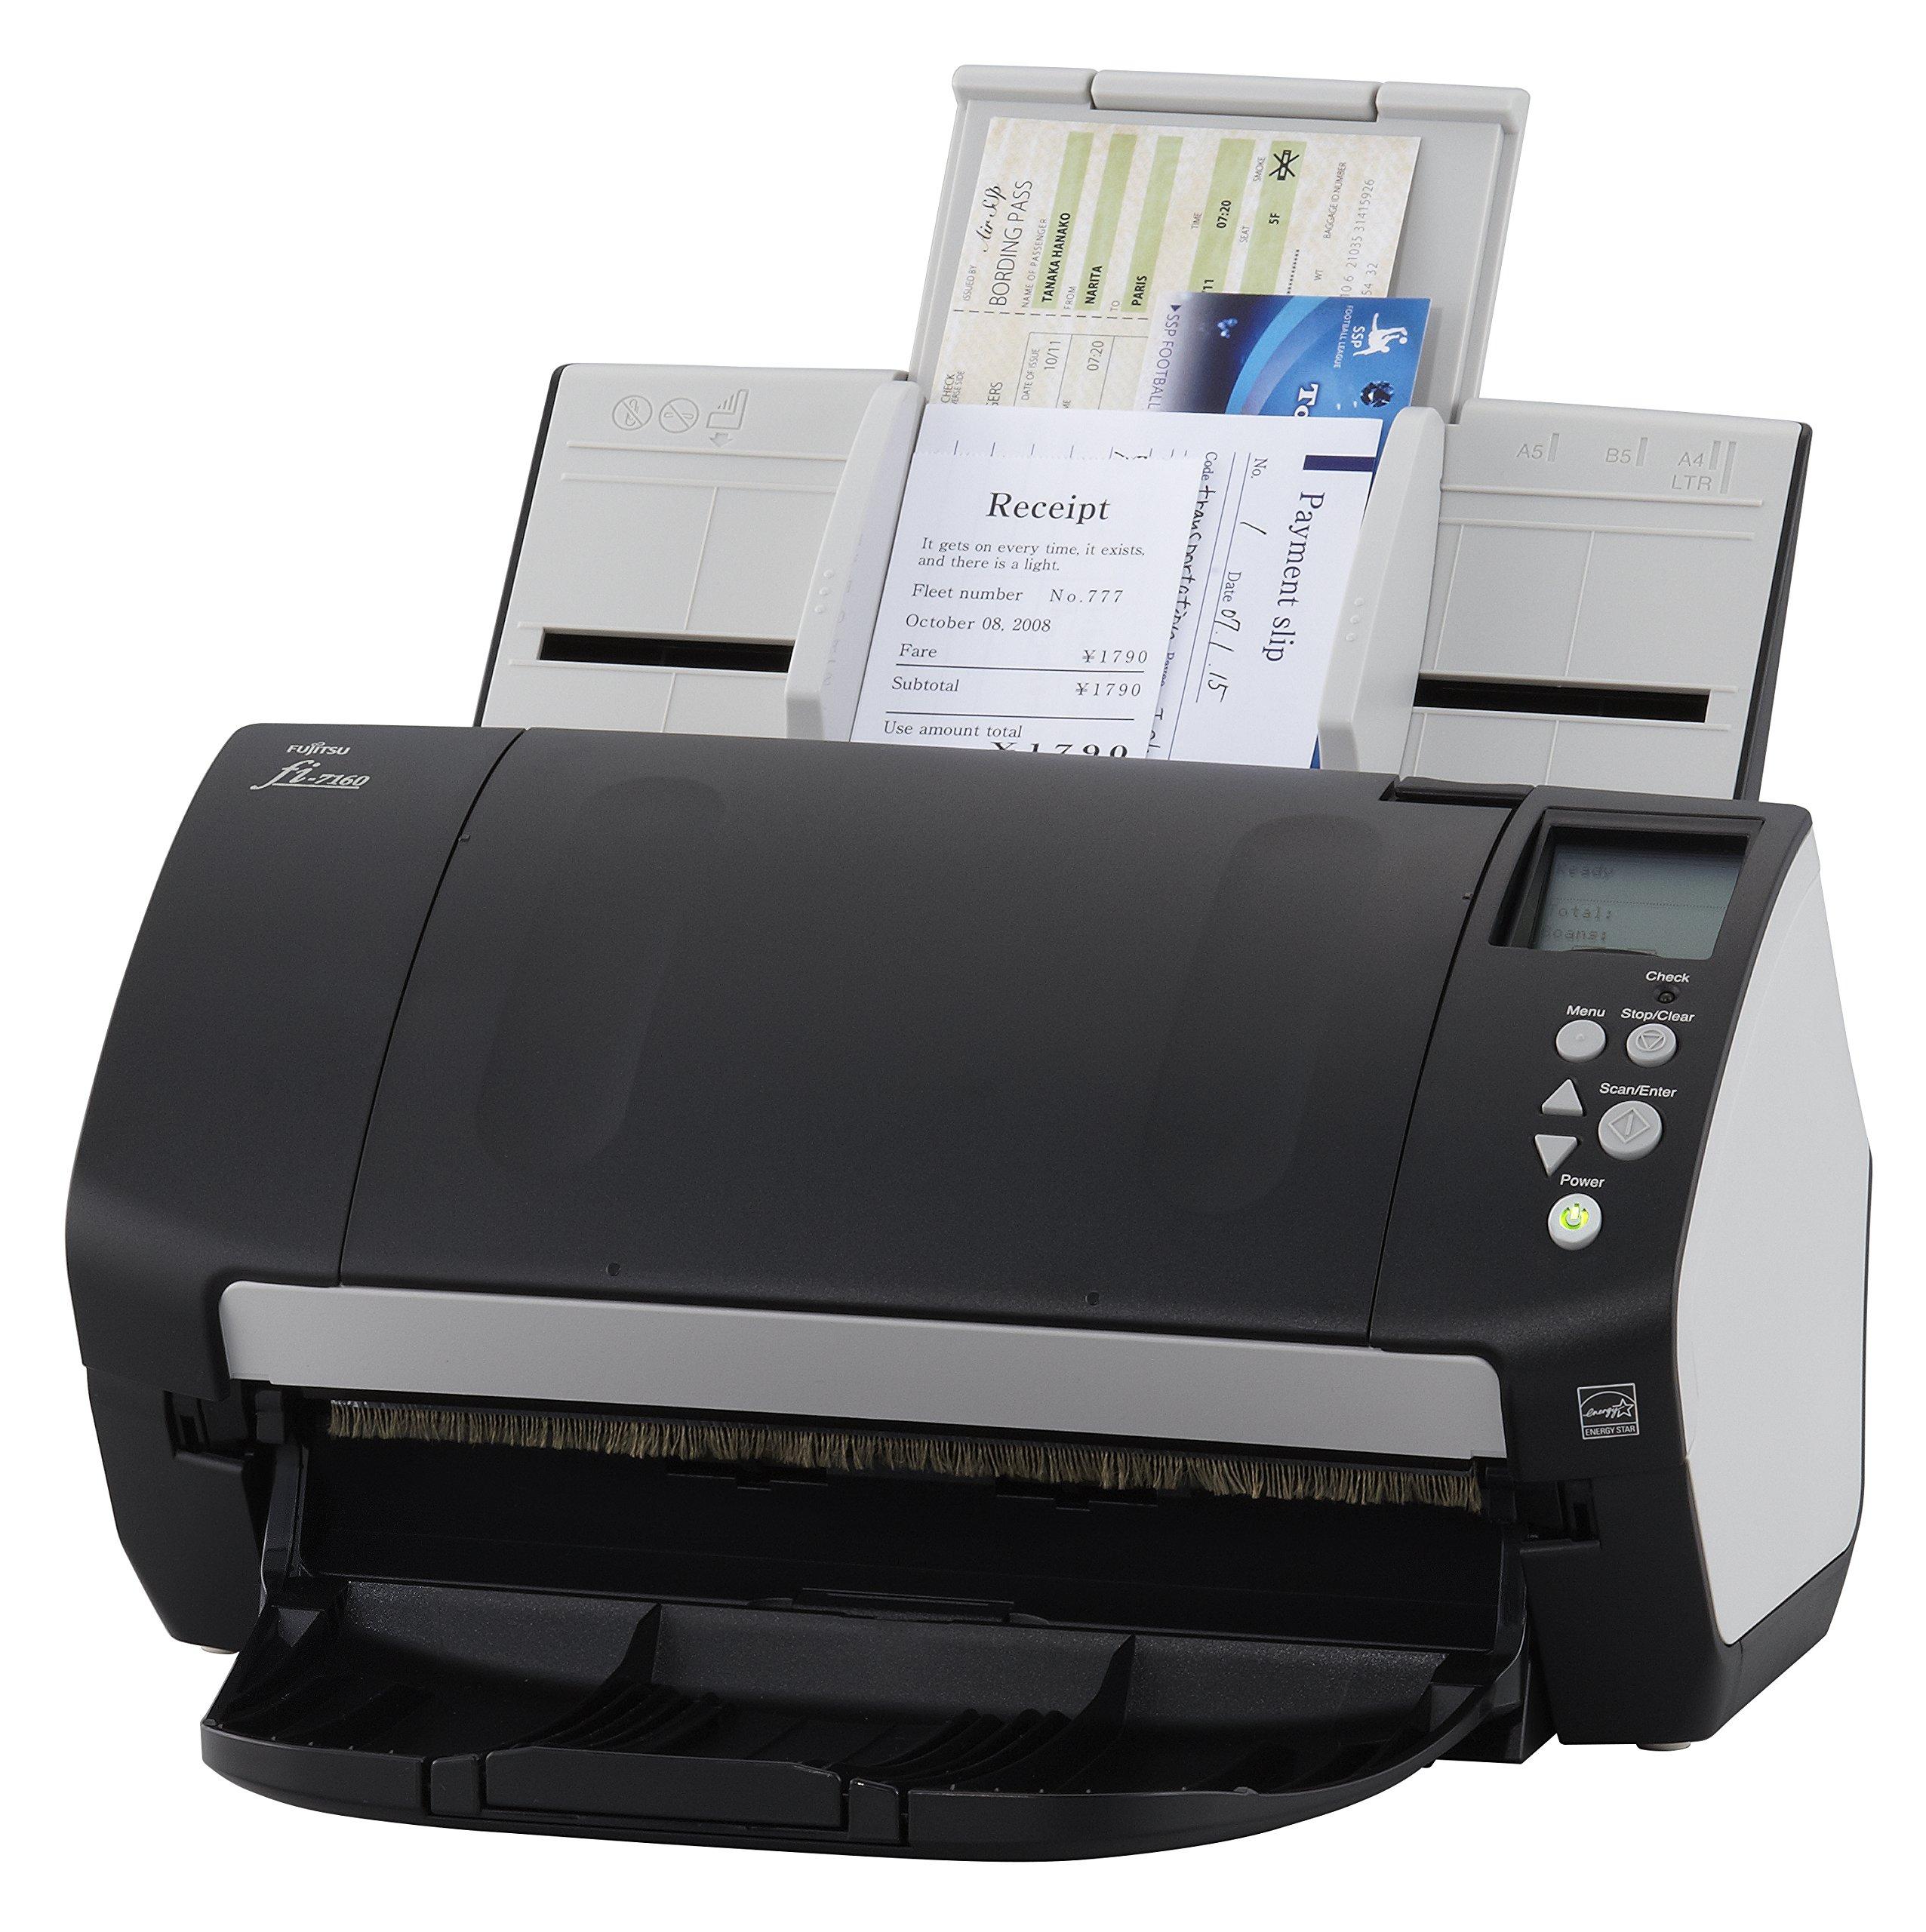 Fujitsu fi-7160 Color Duplex Document Scanner - Workgroup Series by Fujitsu (Image #5)